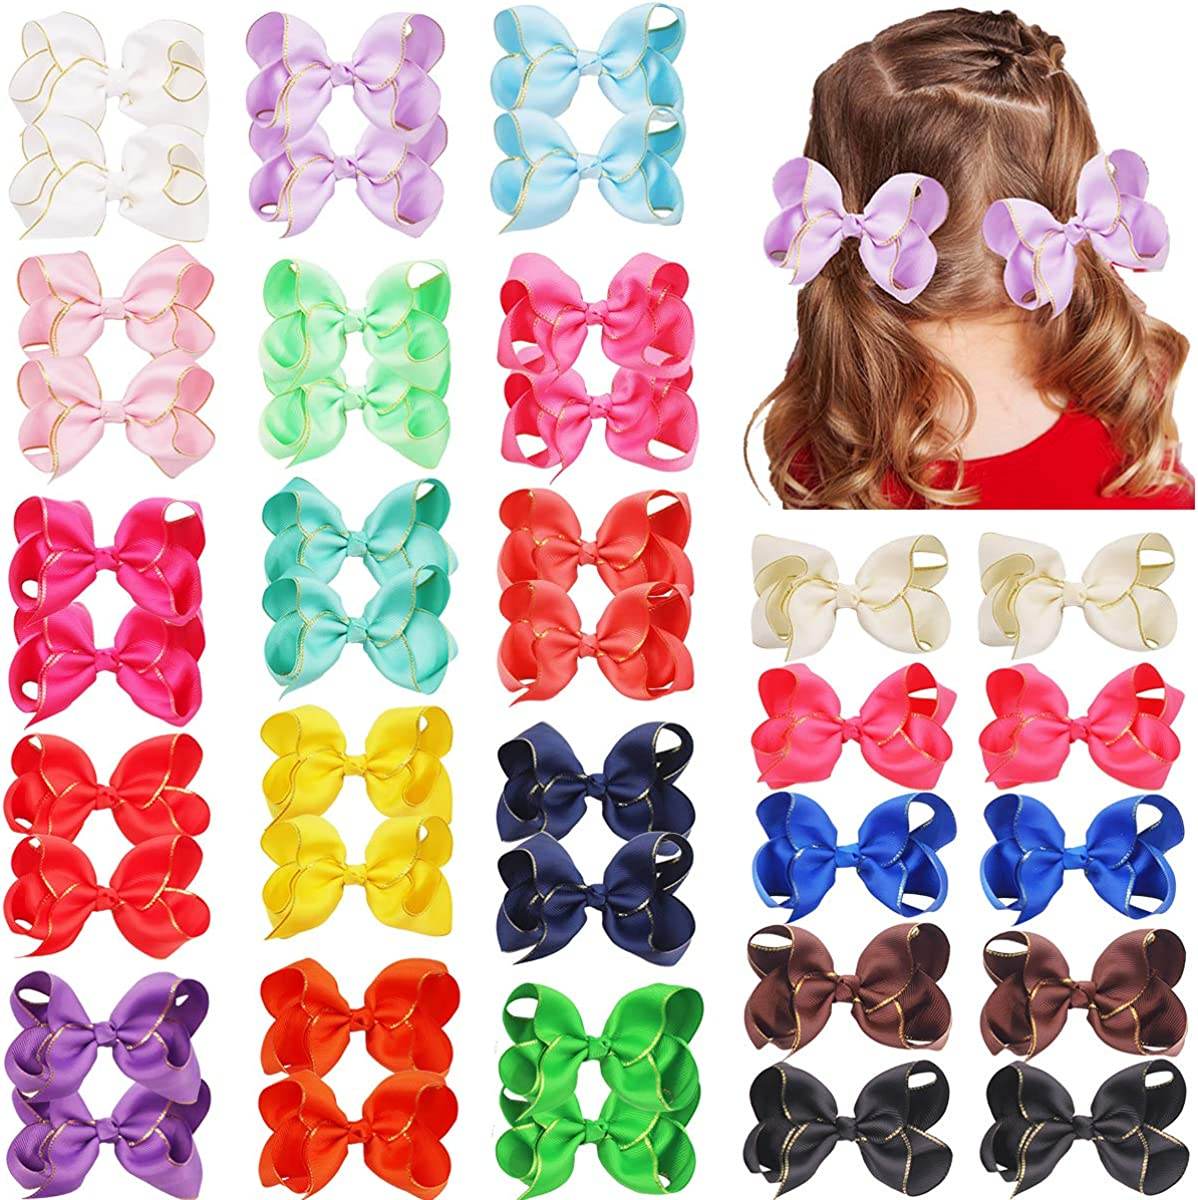 40PCS Baby Girls Max 61% OFF Fees free 4.5Inch Grosgrain Bows Hair Ribbon Alligator Ha